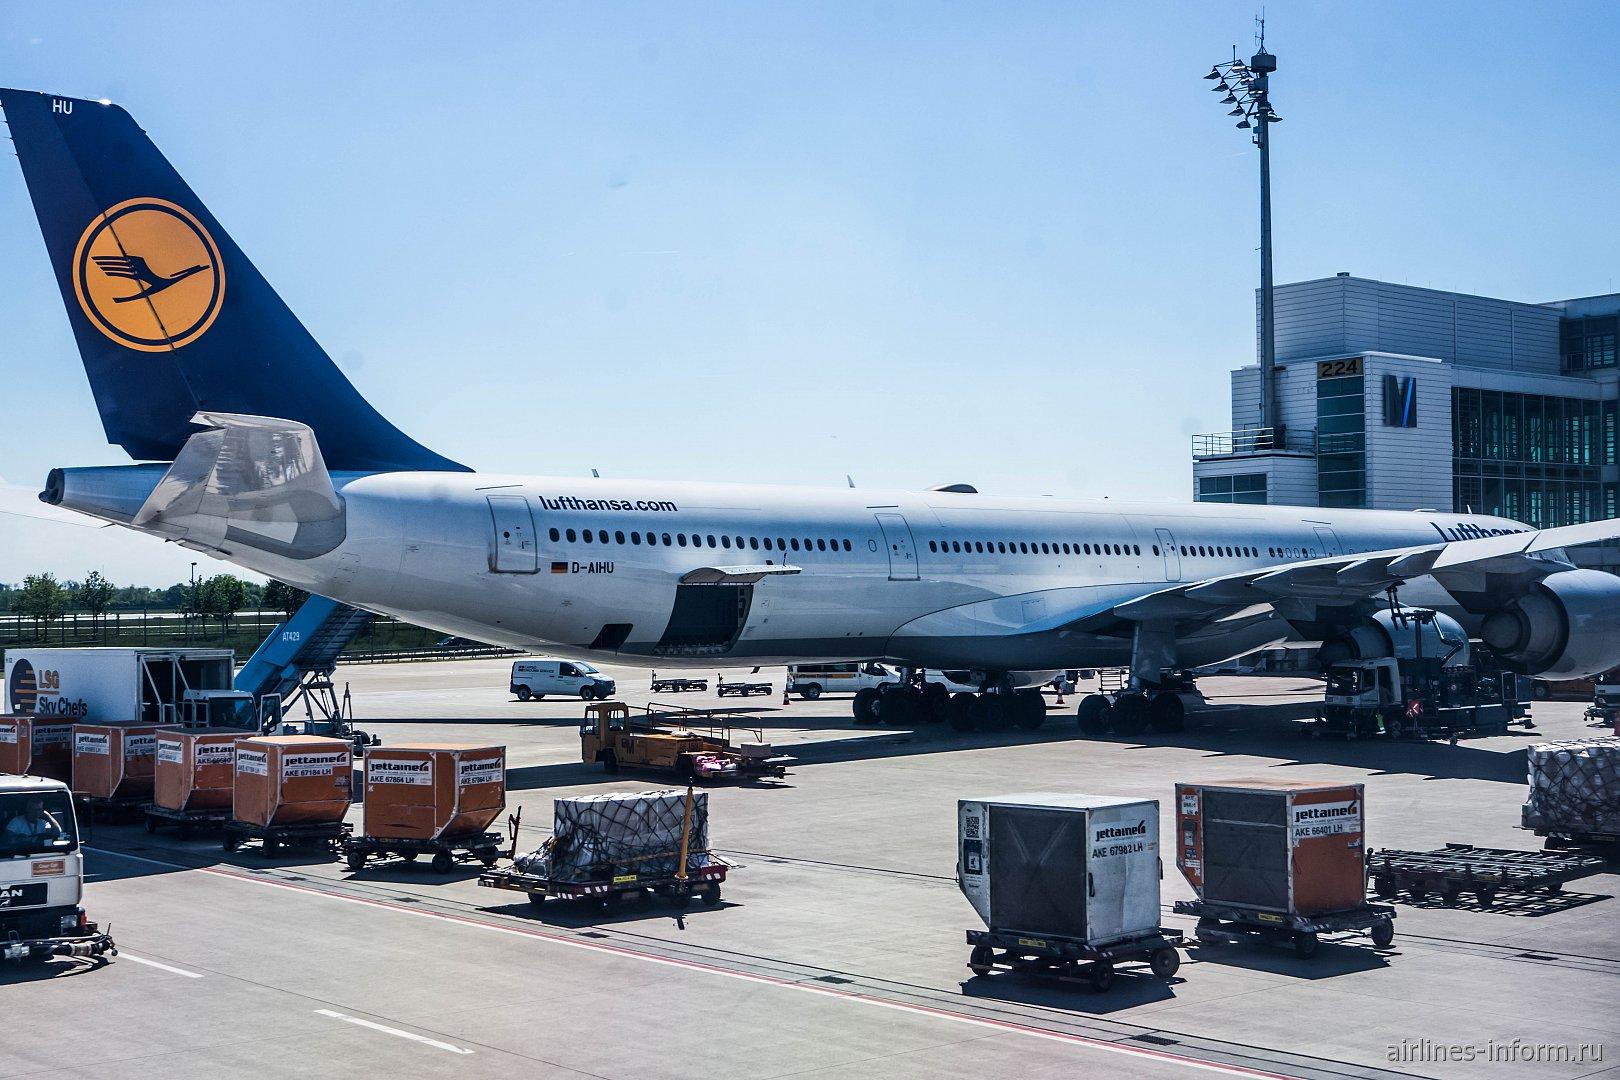 Airbus A340-600 авиакомпании Lufthansa в аэропорту Мюнхен